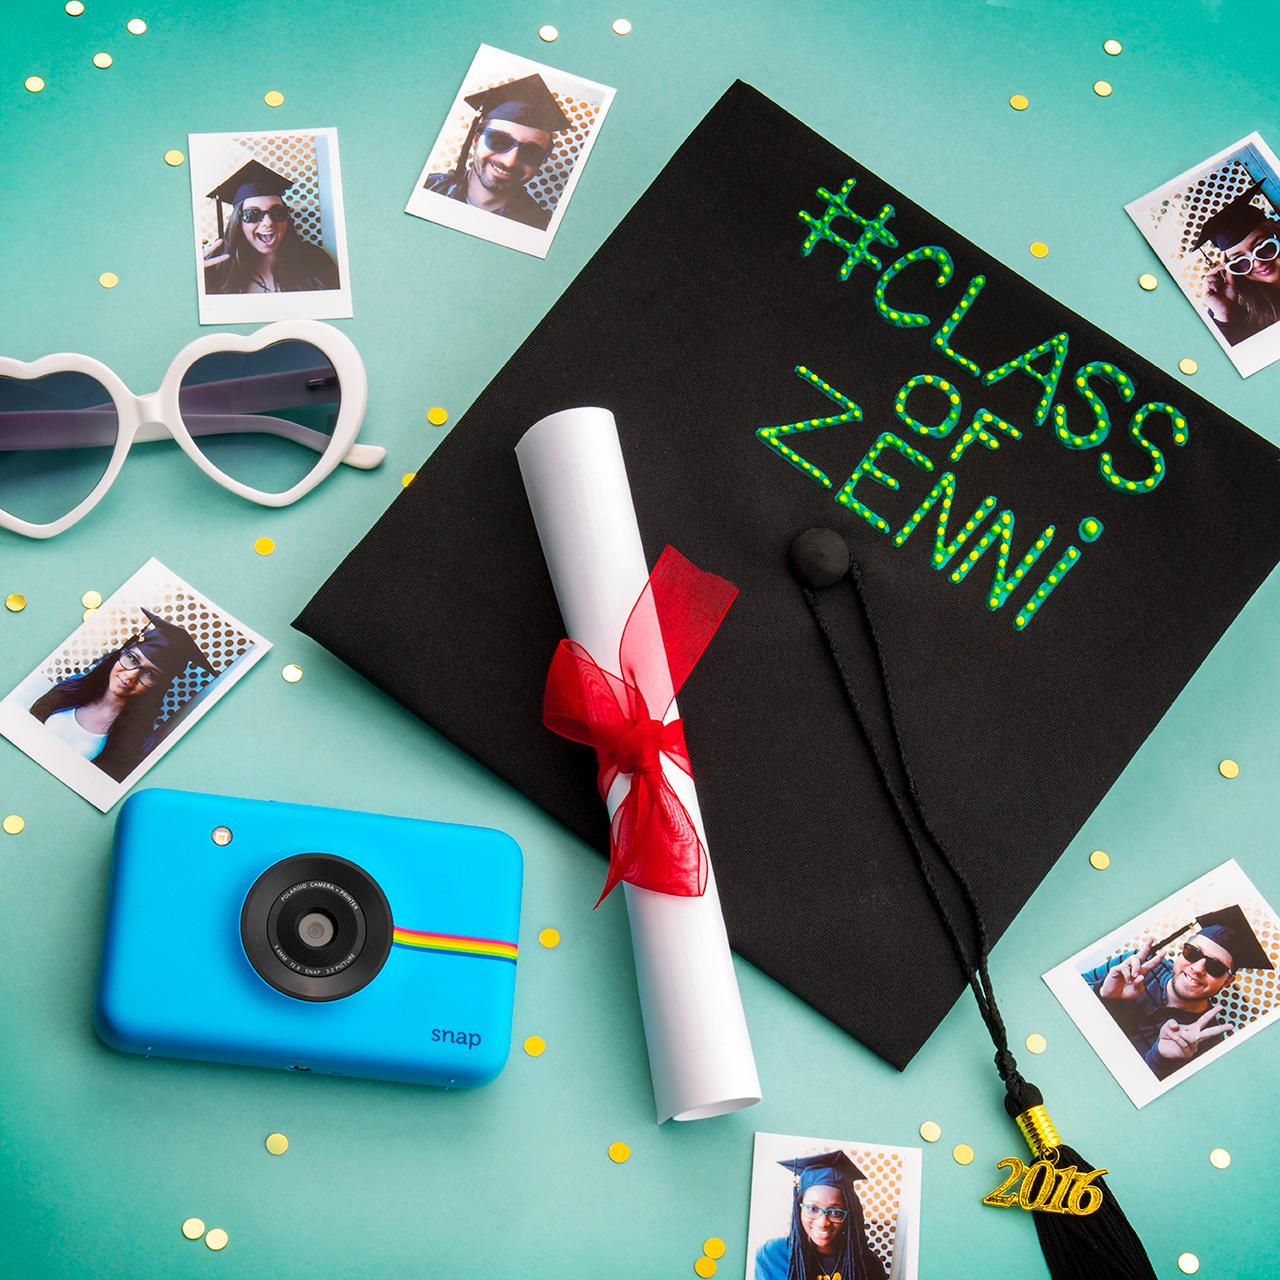 ae583e33d95 Zenni Optical Supports Graduates with  1 Million Eyewear Giveaway ...